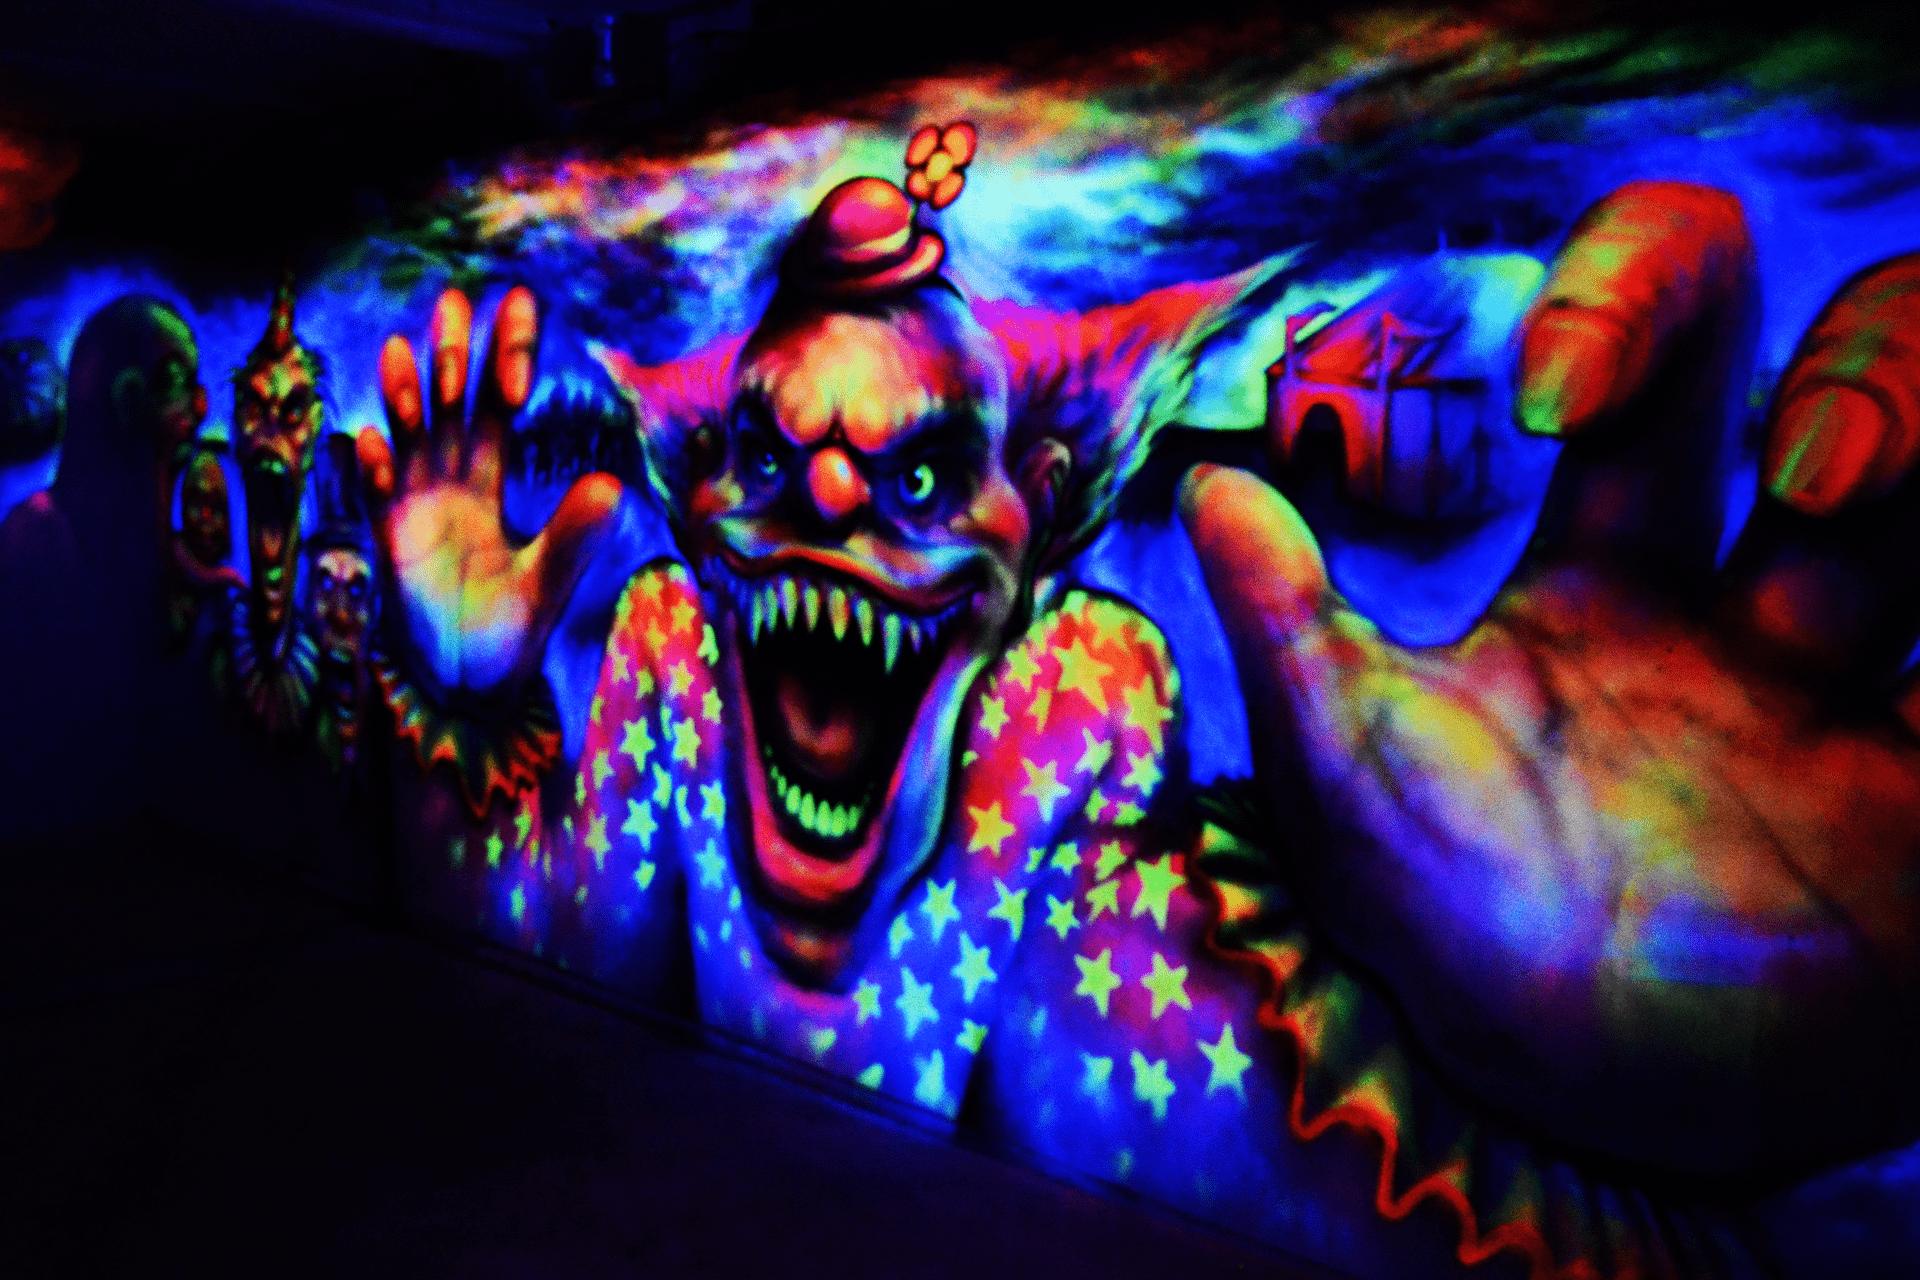 Cirkus DYSTOPIA Tivoli Friheden Halloween klovnevæg